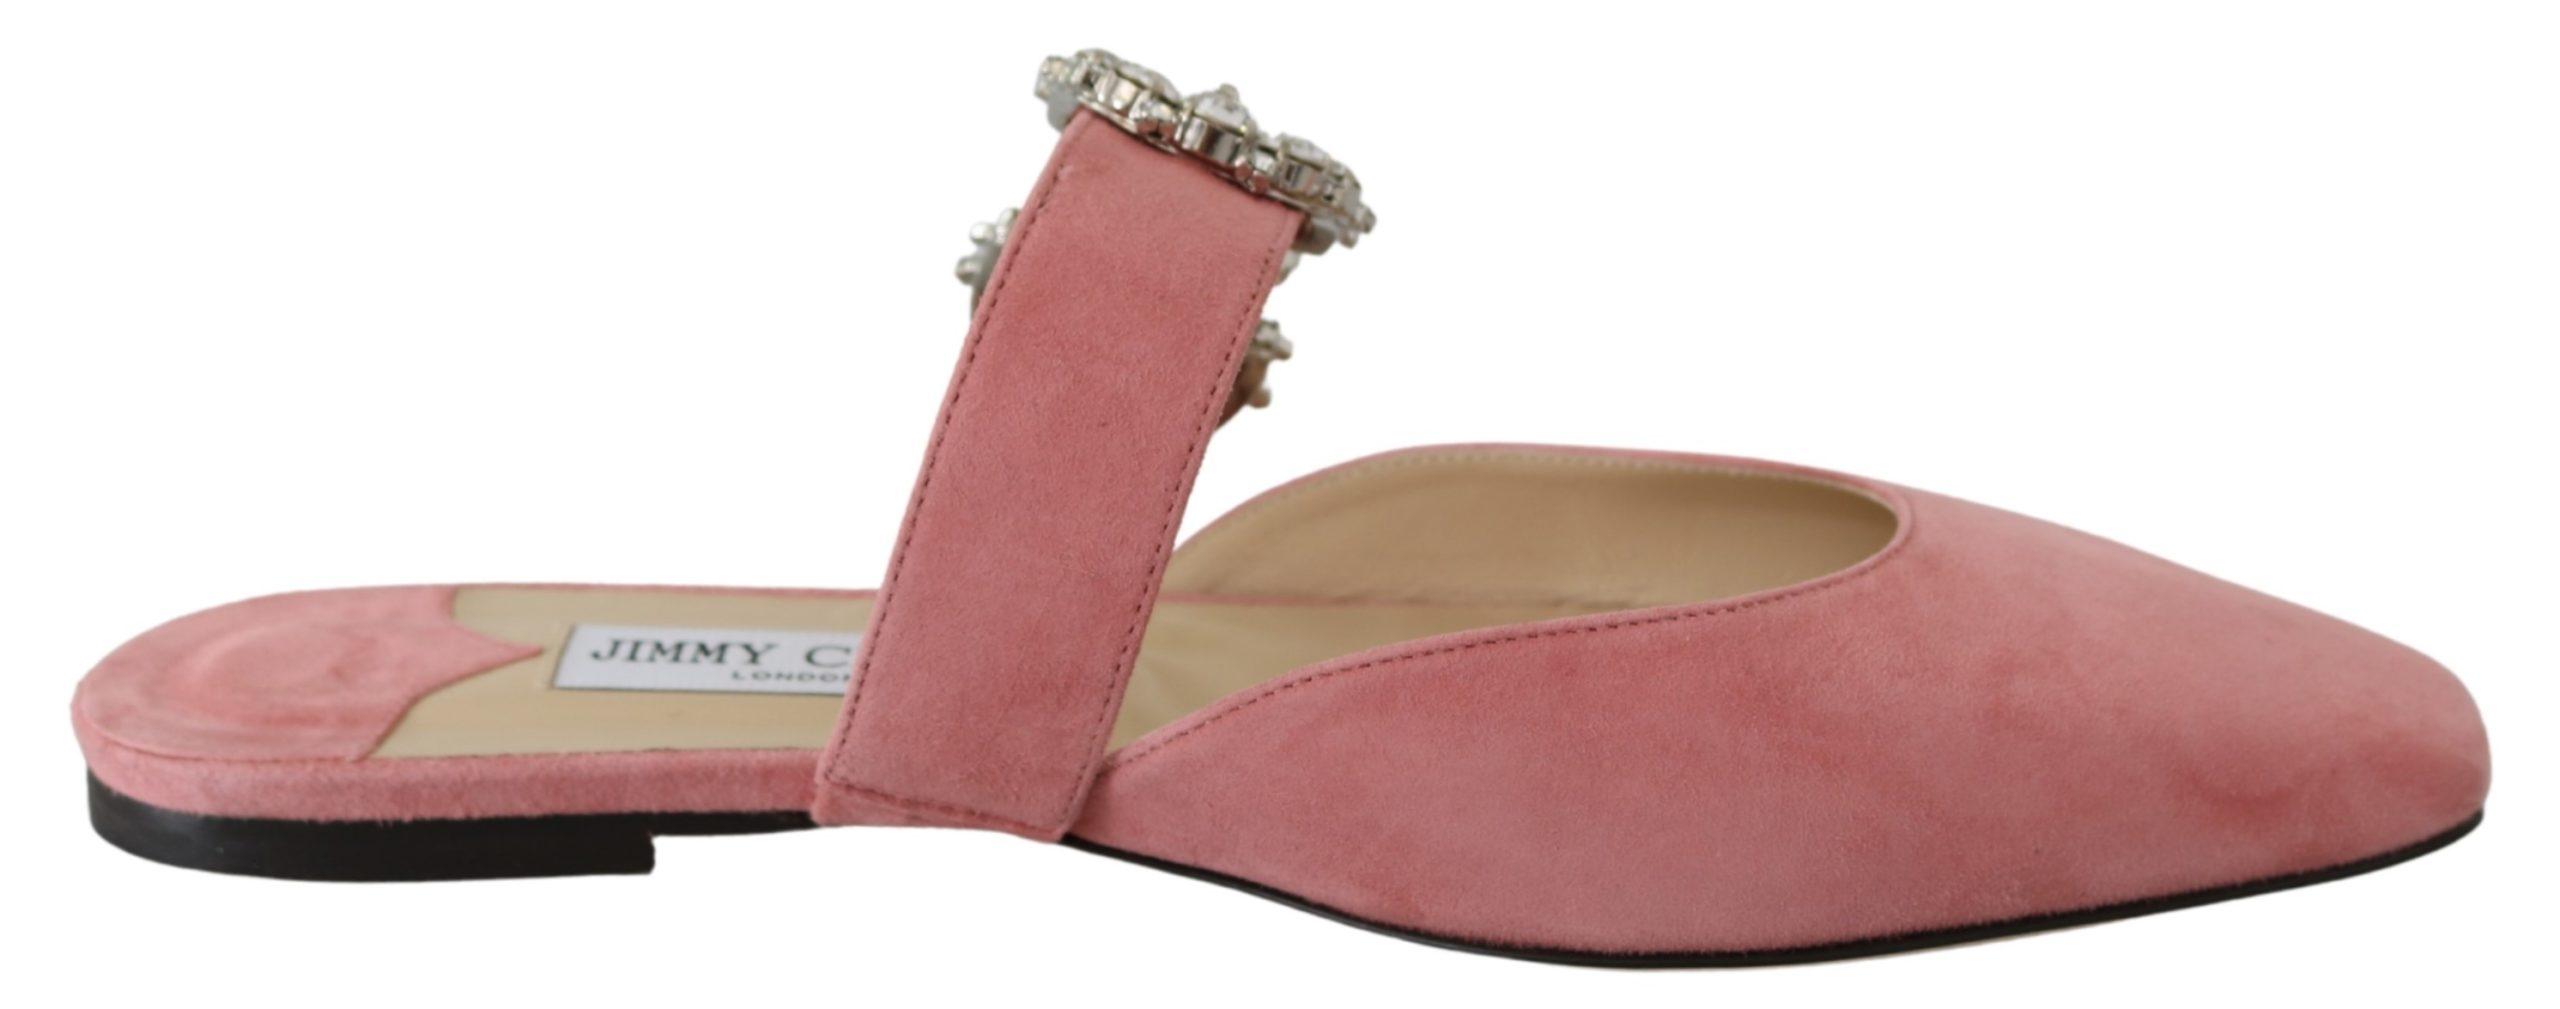 Jimmy Choo Women's Gee Candyfloss Flat Shoes Pink 192954306441 - EU39/US9